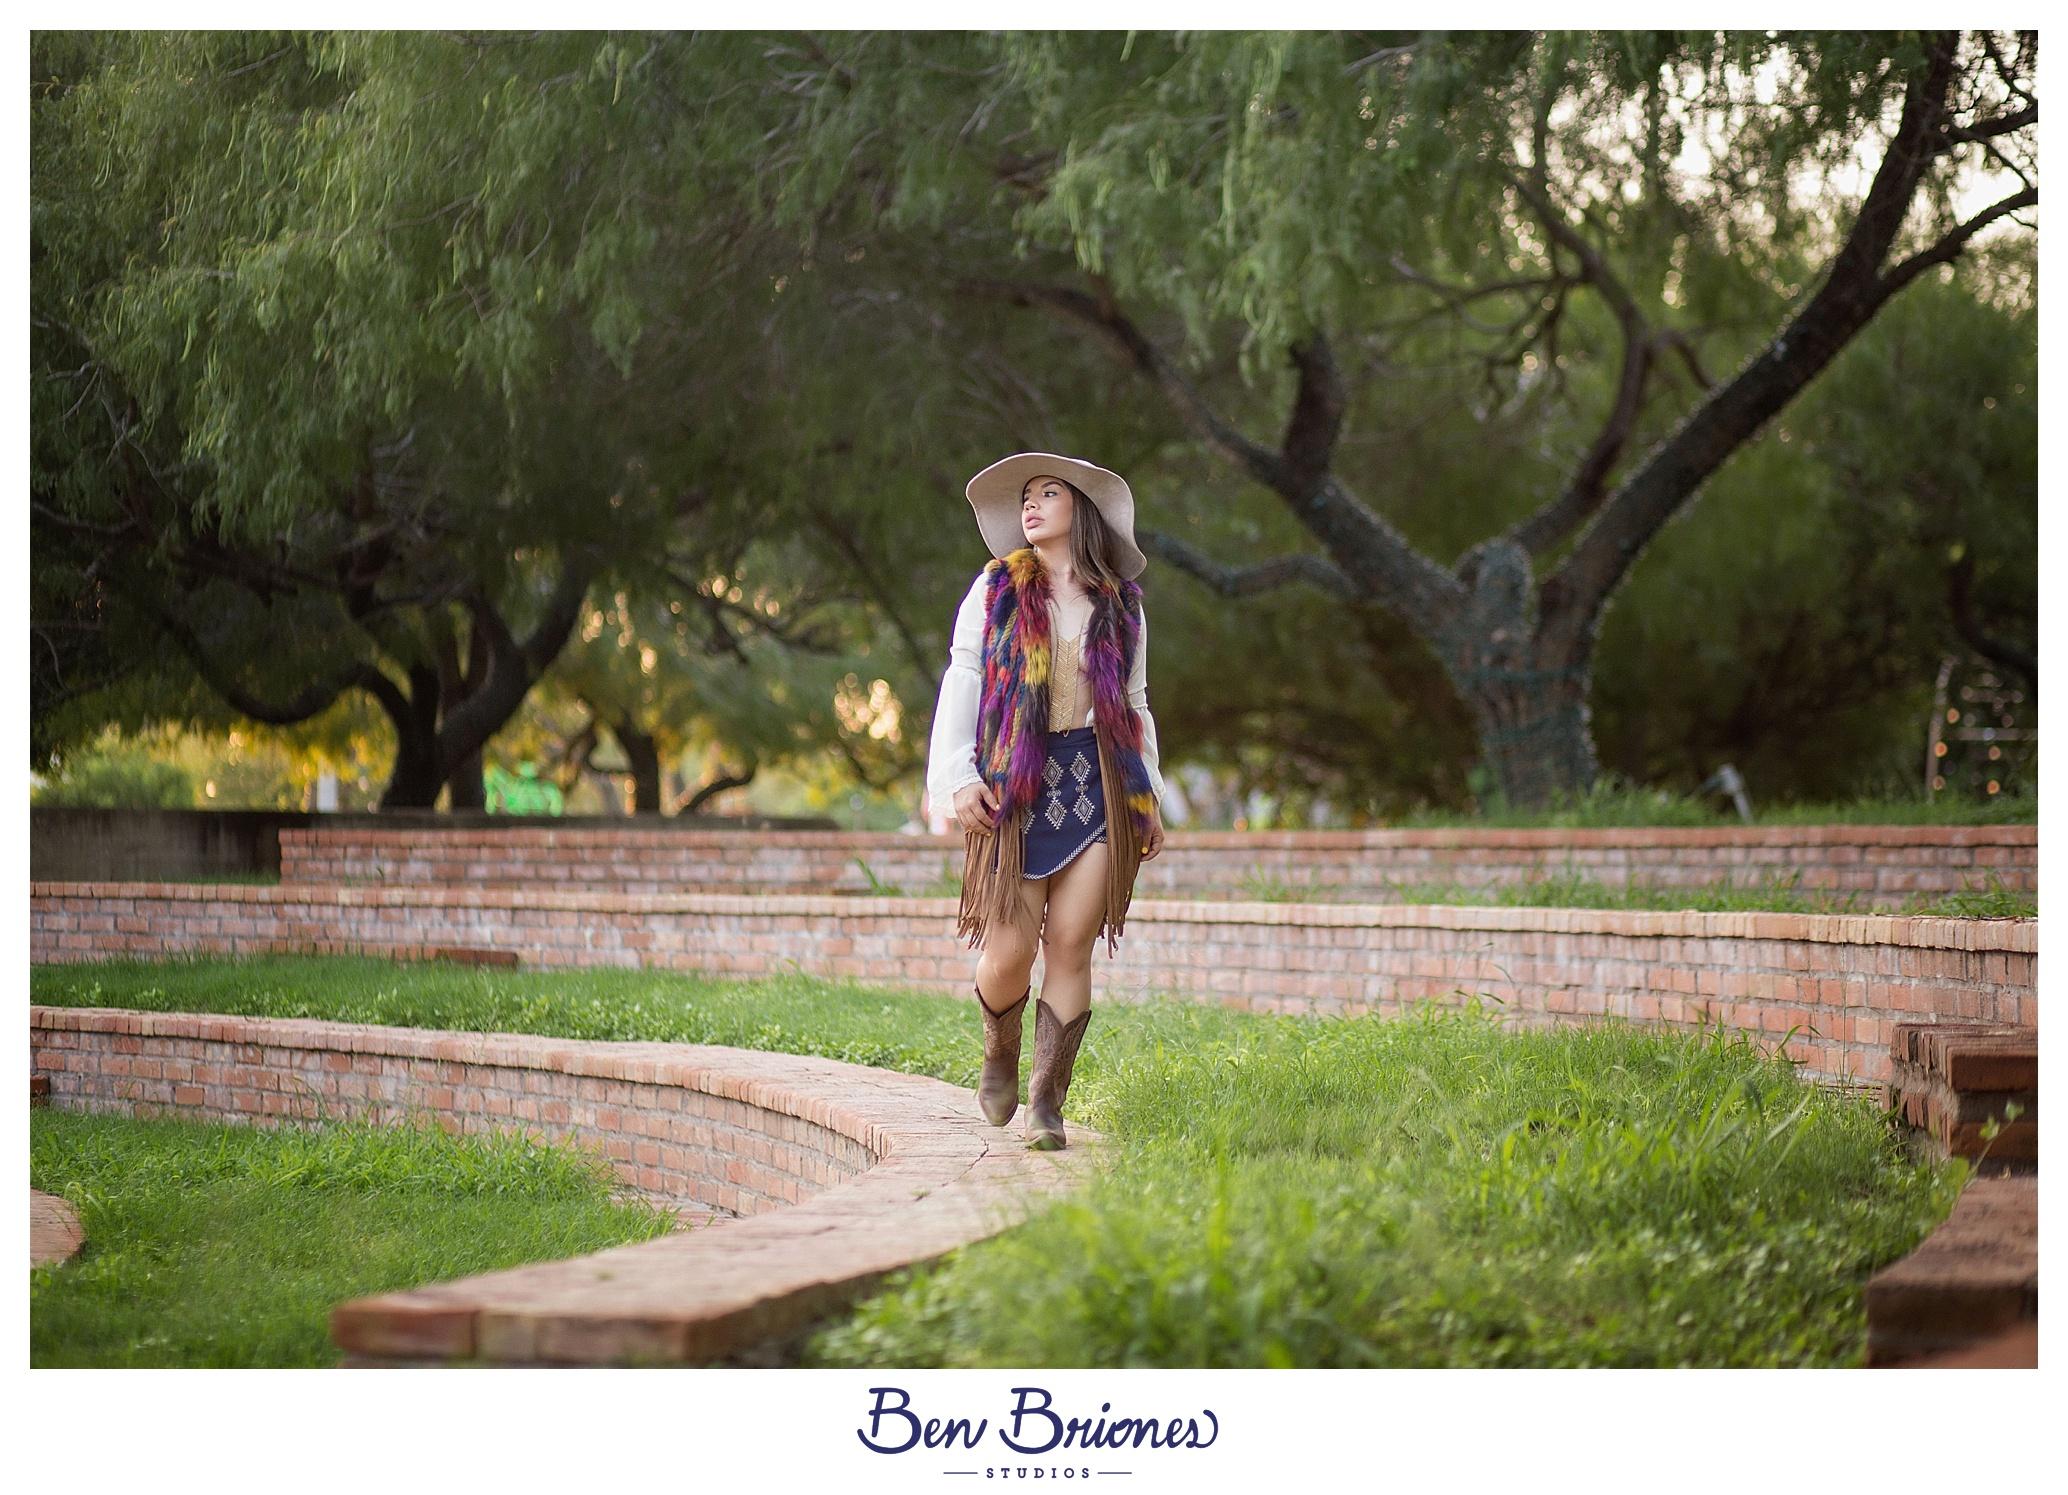 06.22.18_PRINT_Jessica Styles MUA Portraits_BBS-6611_WEB